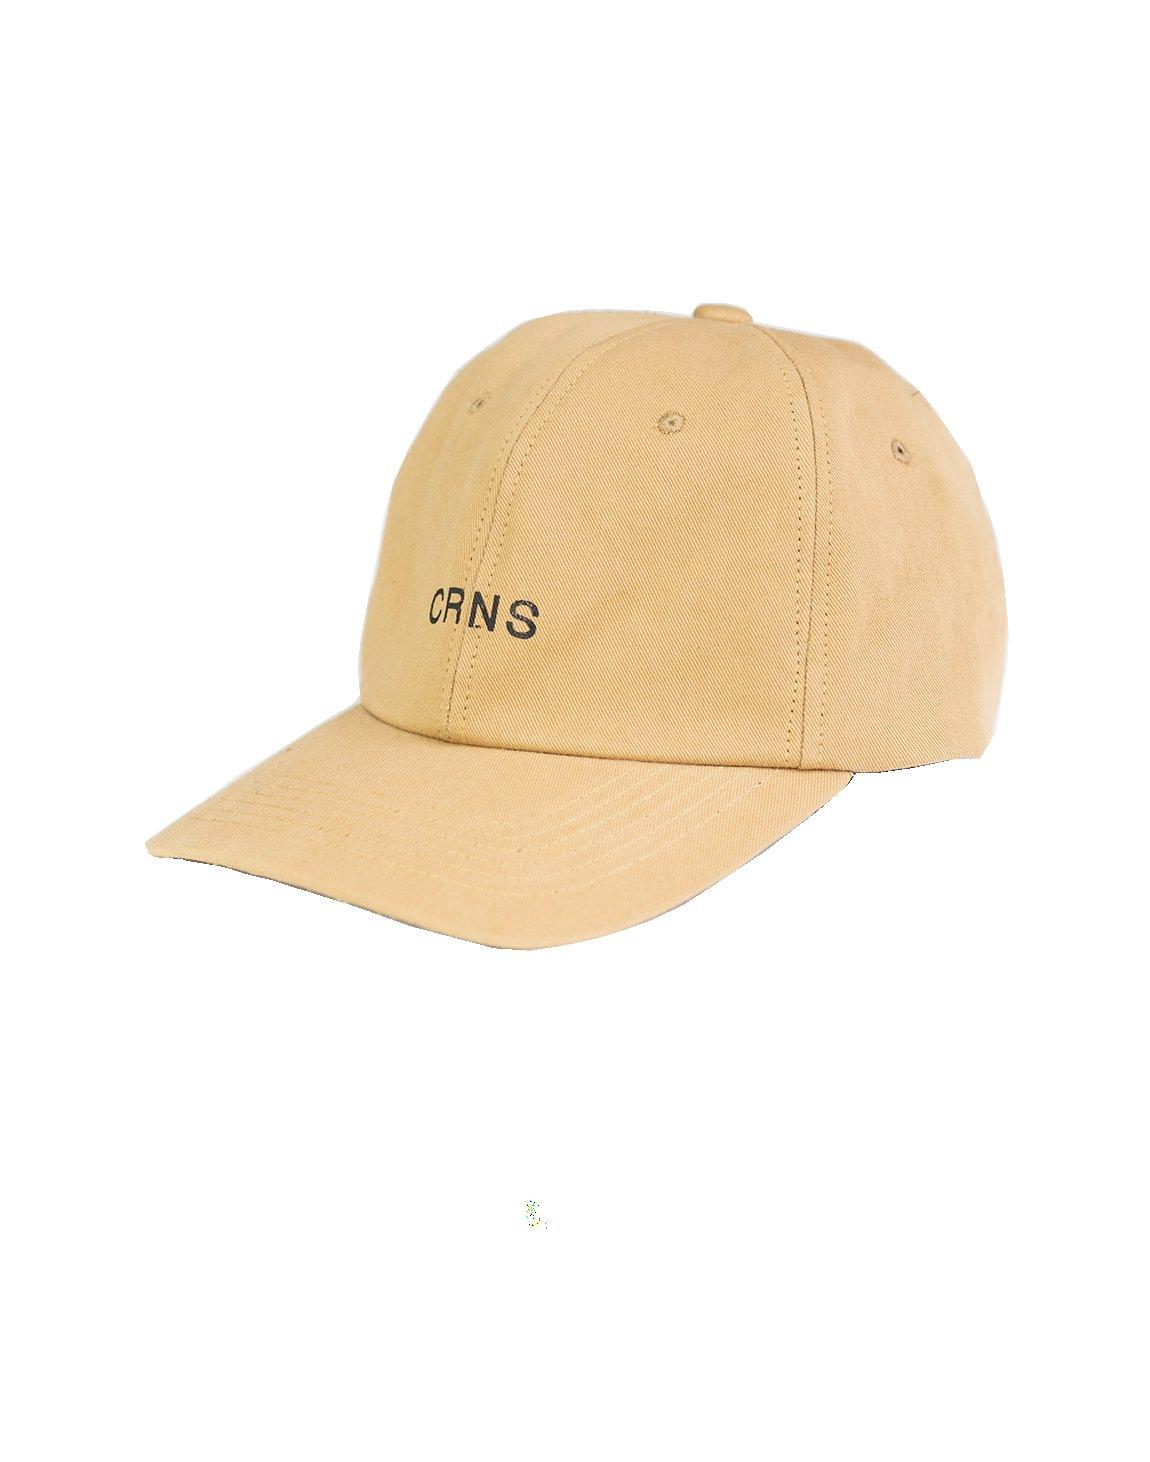 CRNS WASH LOGO CAP BEIGE